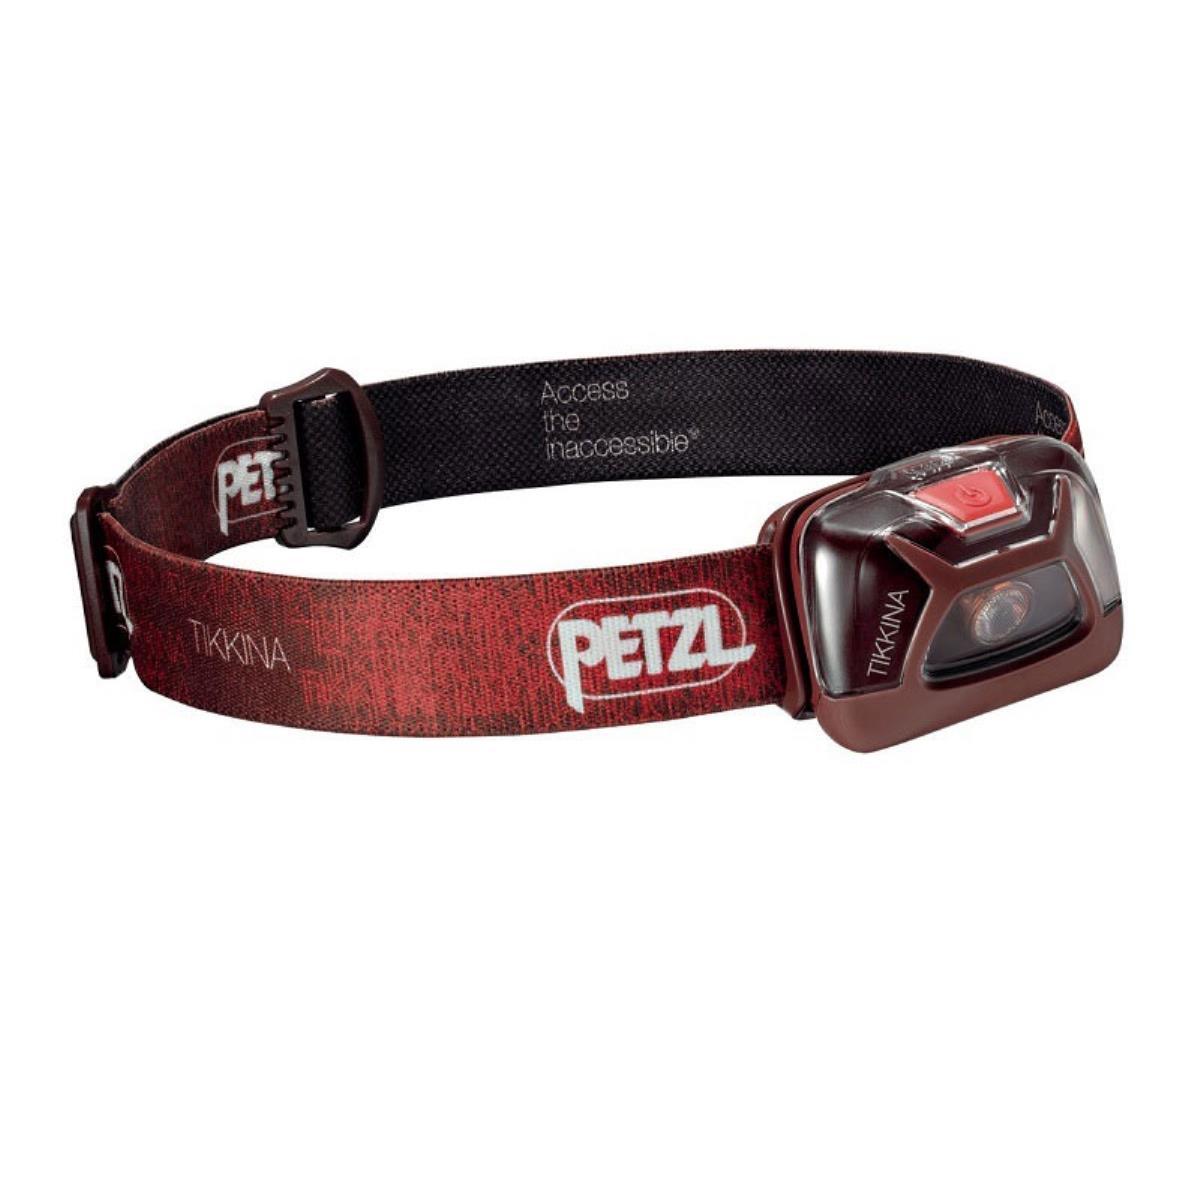 Lantern Head Tikkina Red Petzl (e91abb)